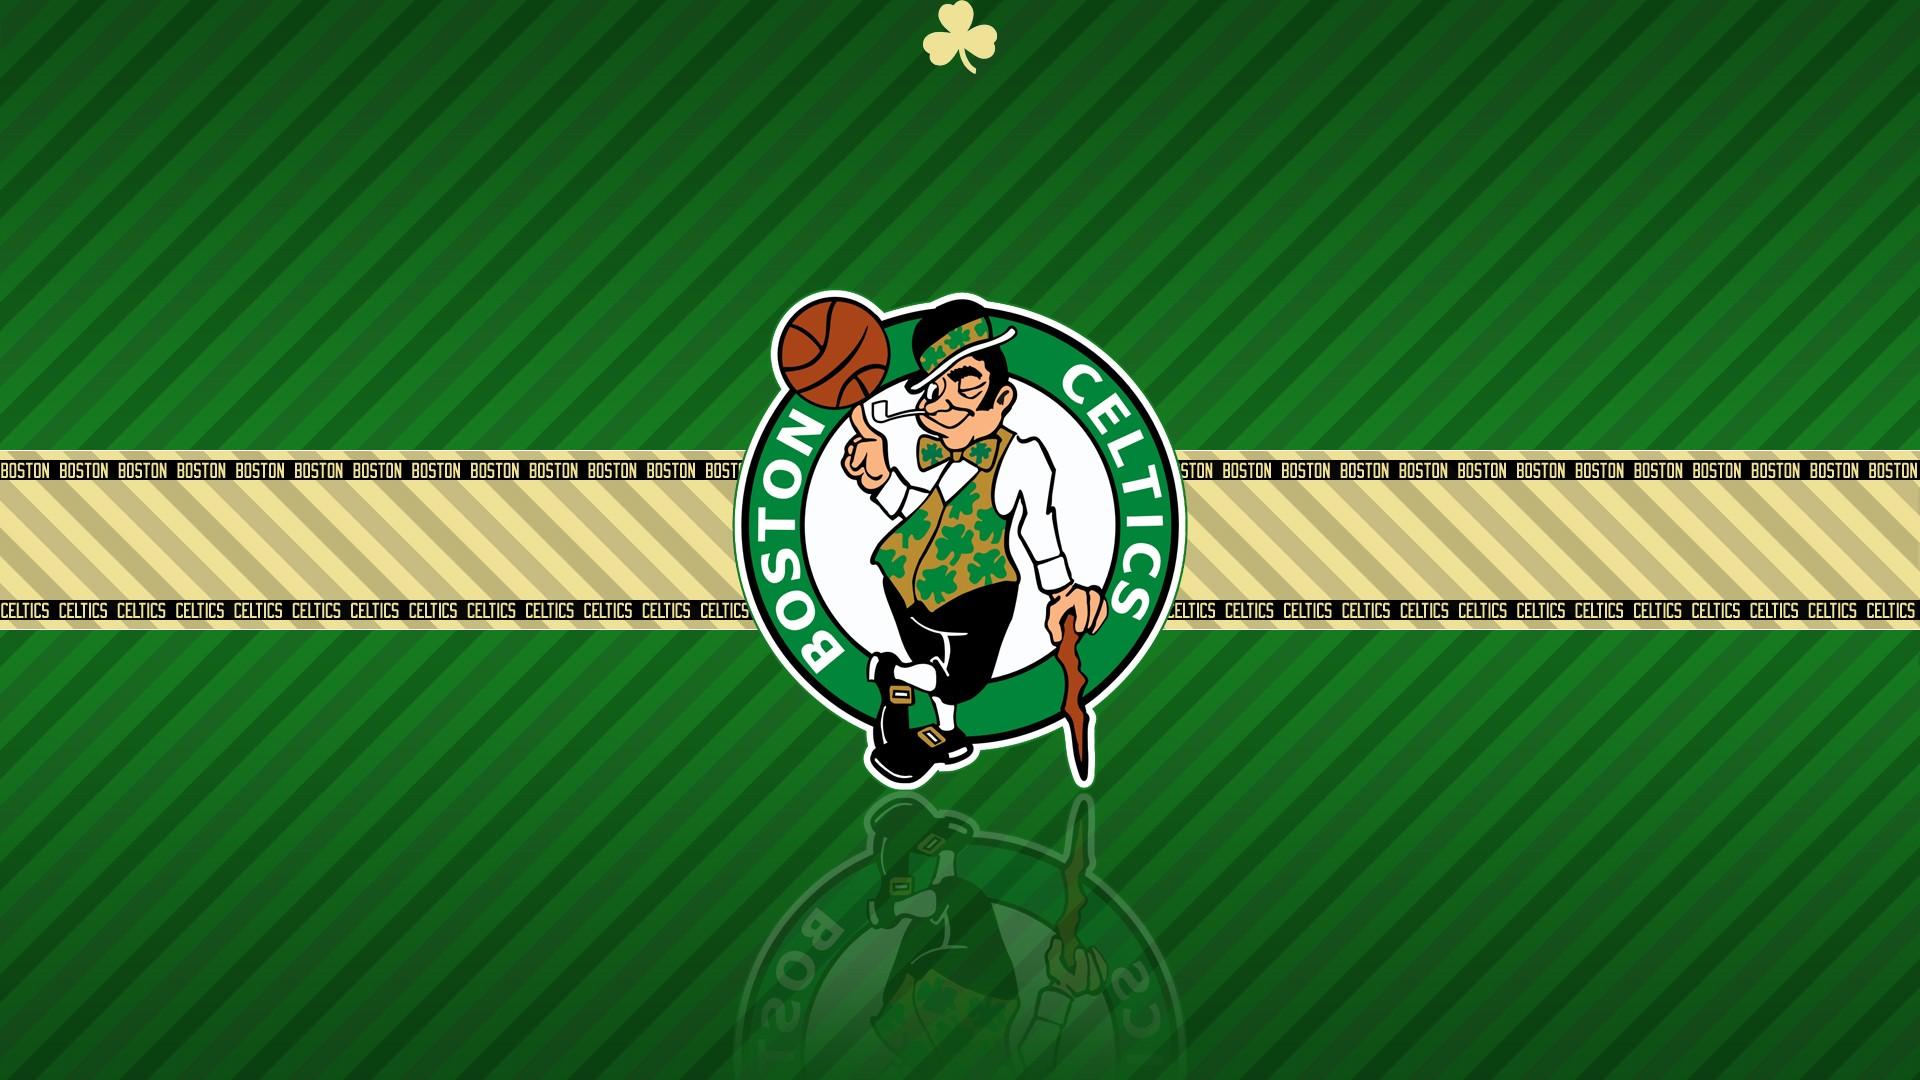 boston celtics iphone wallpaper hd